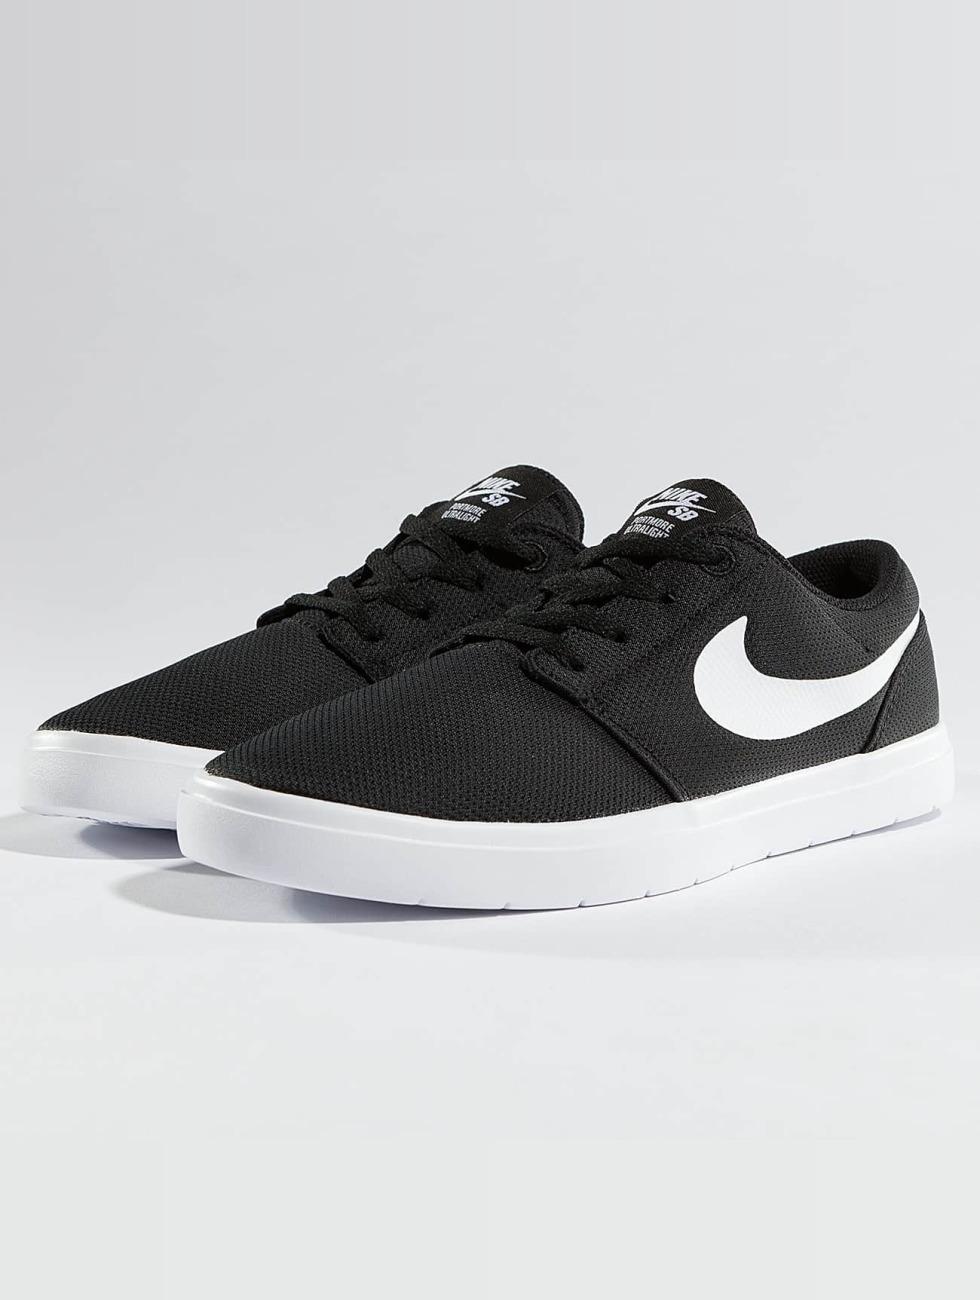 Nike 530 Ii Dqwiaqrfx 426 Più Sneaker Scarpa Porta Ultraleggero Nero Sb jUVpGLqSzM